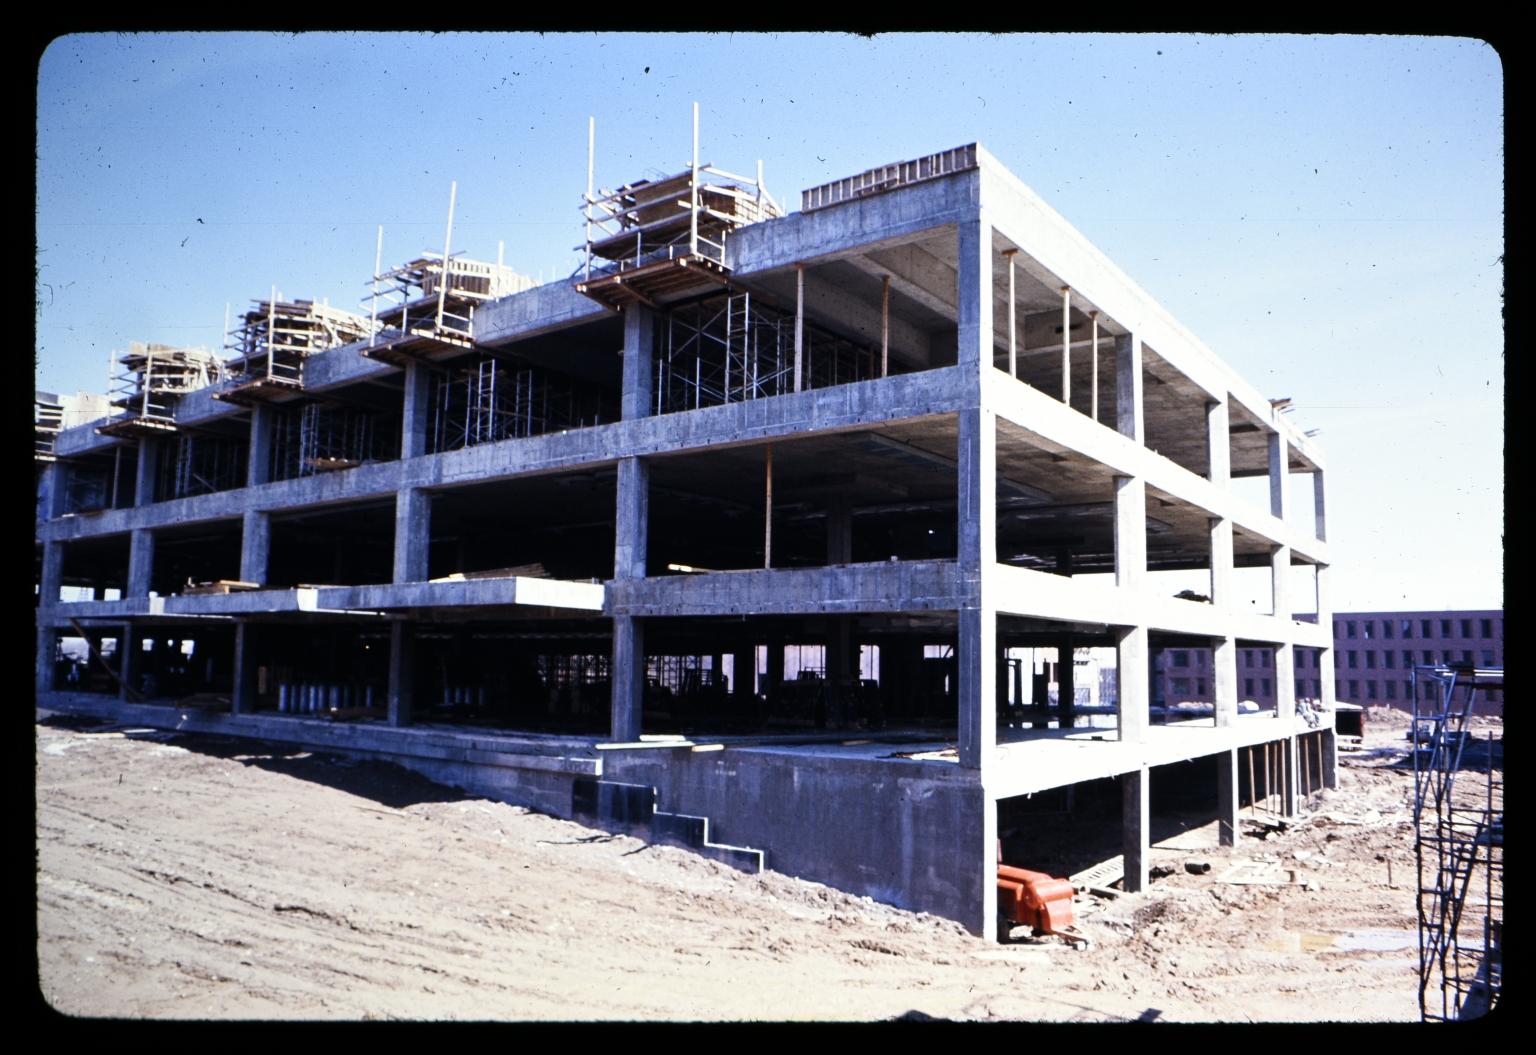 James E. Booth Hall construction